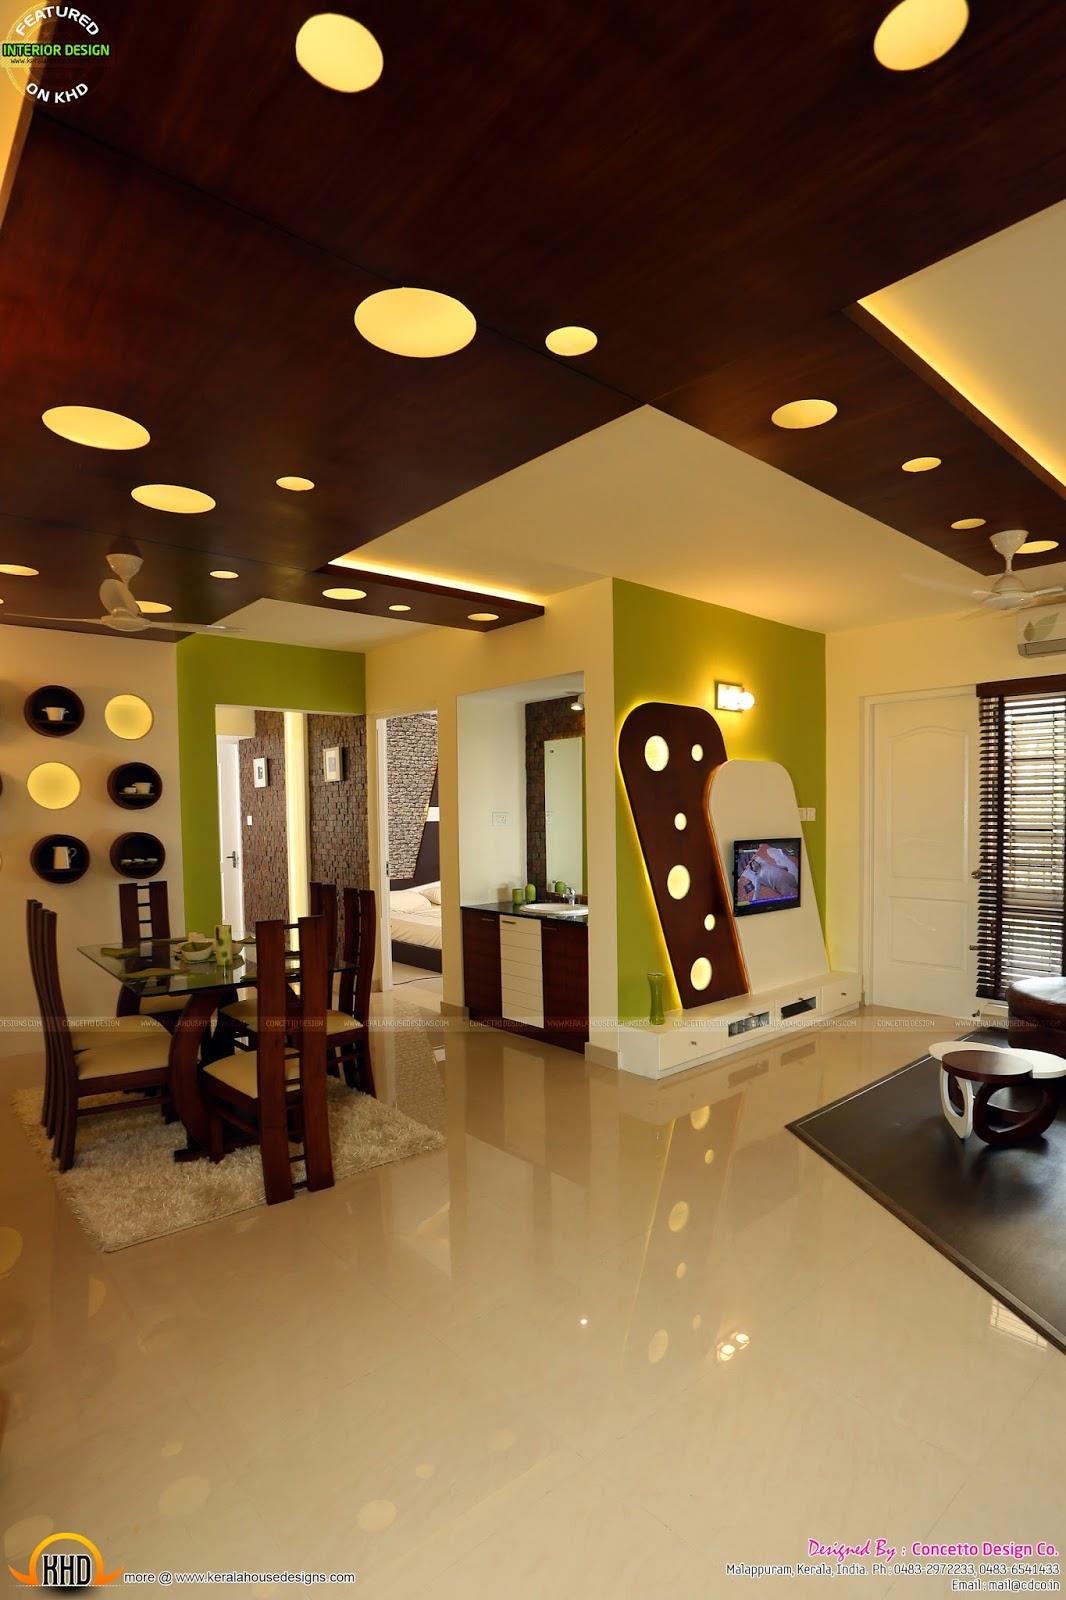 Kerala House Interior Design: Kerala Home Design And Floor